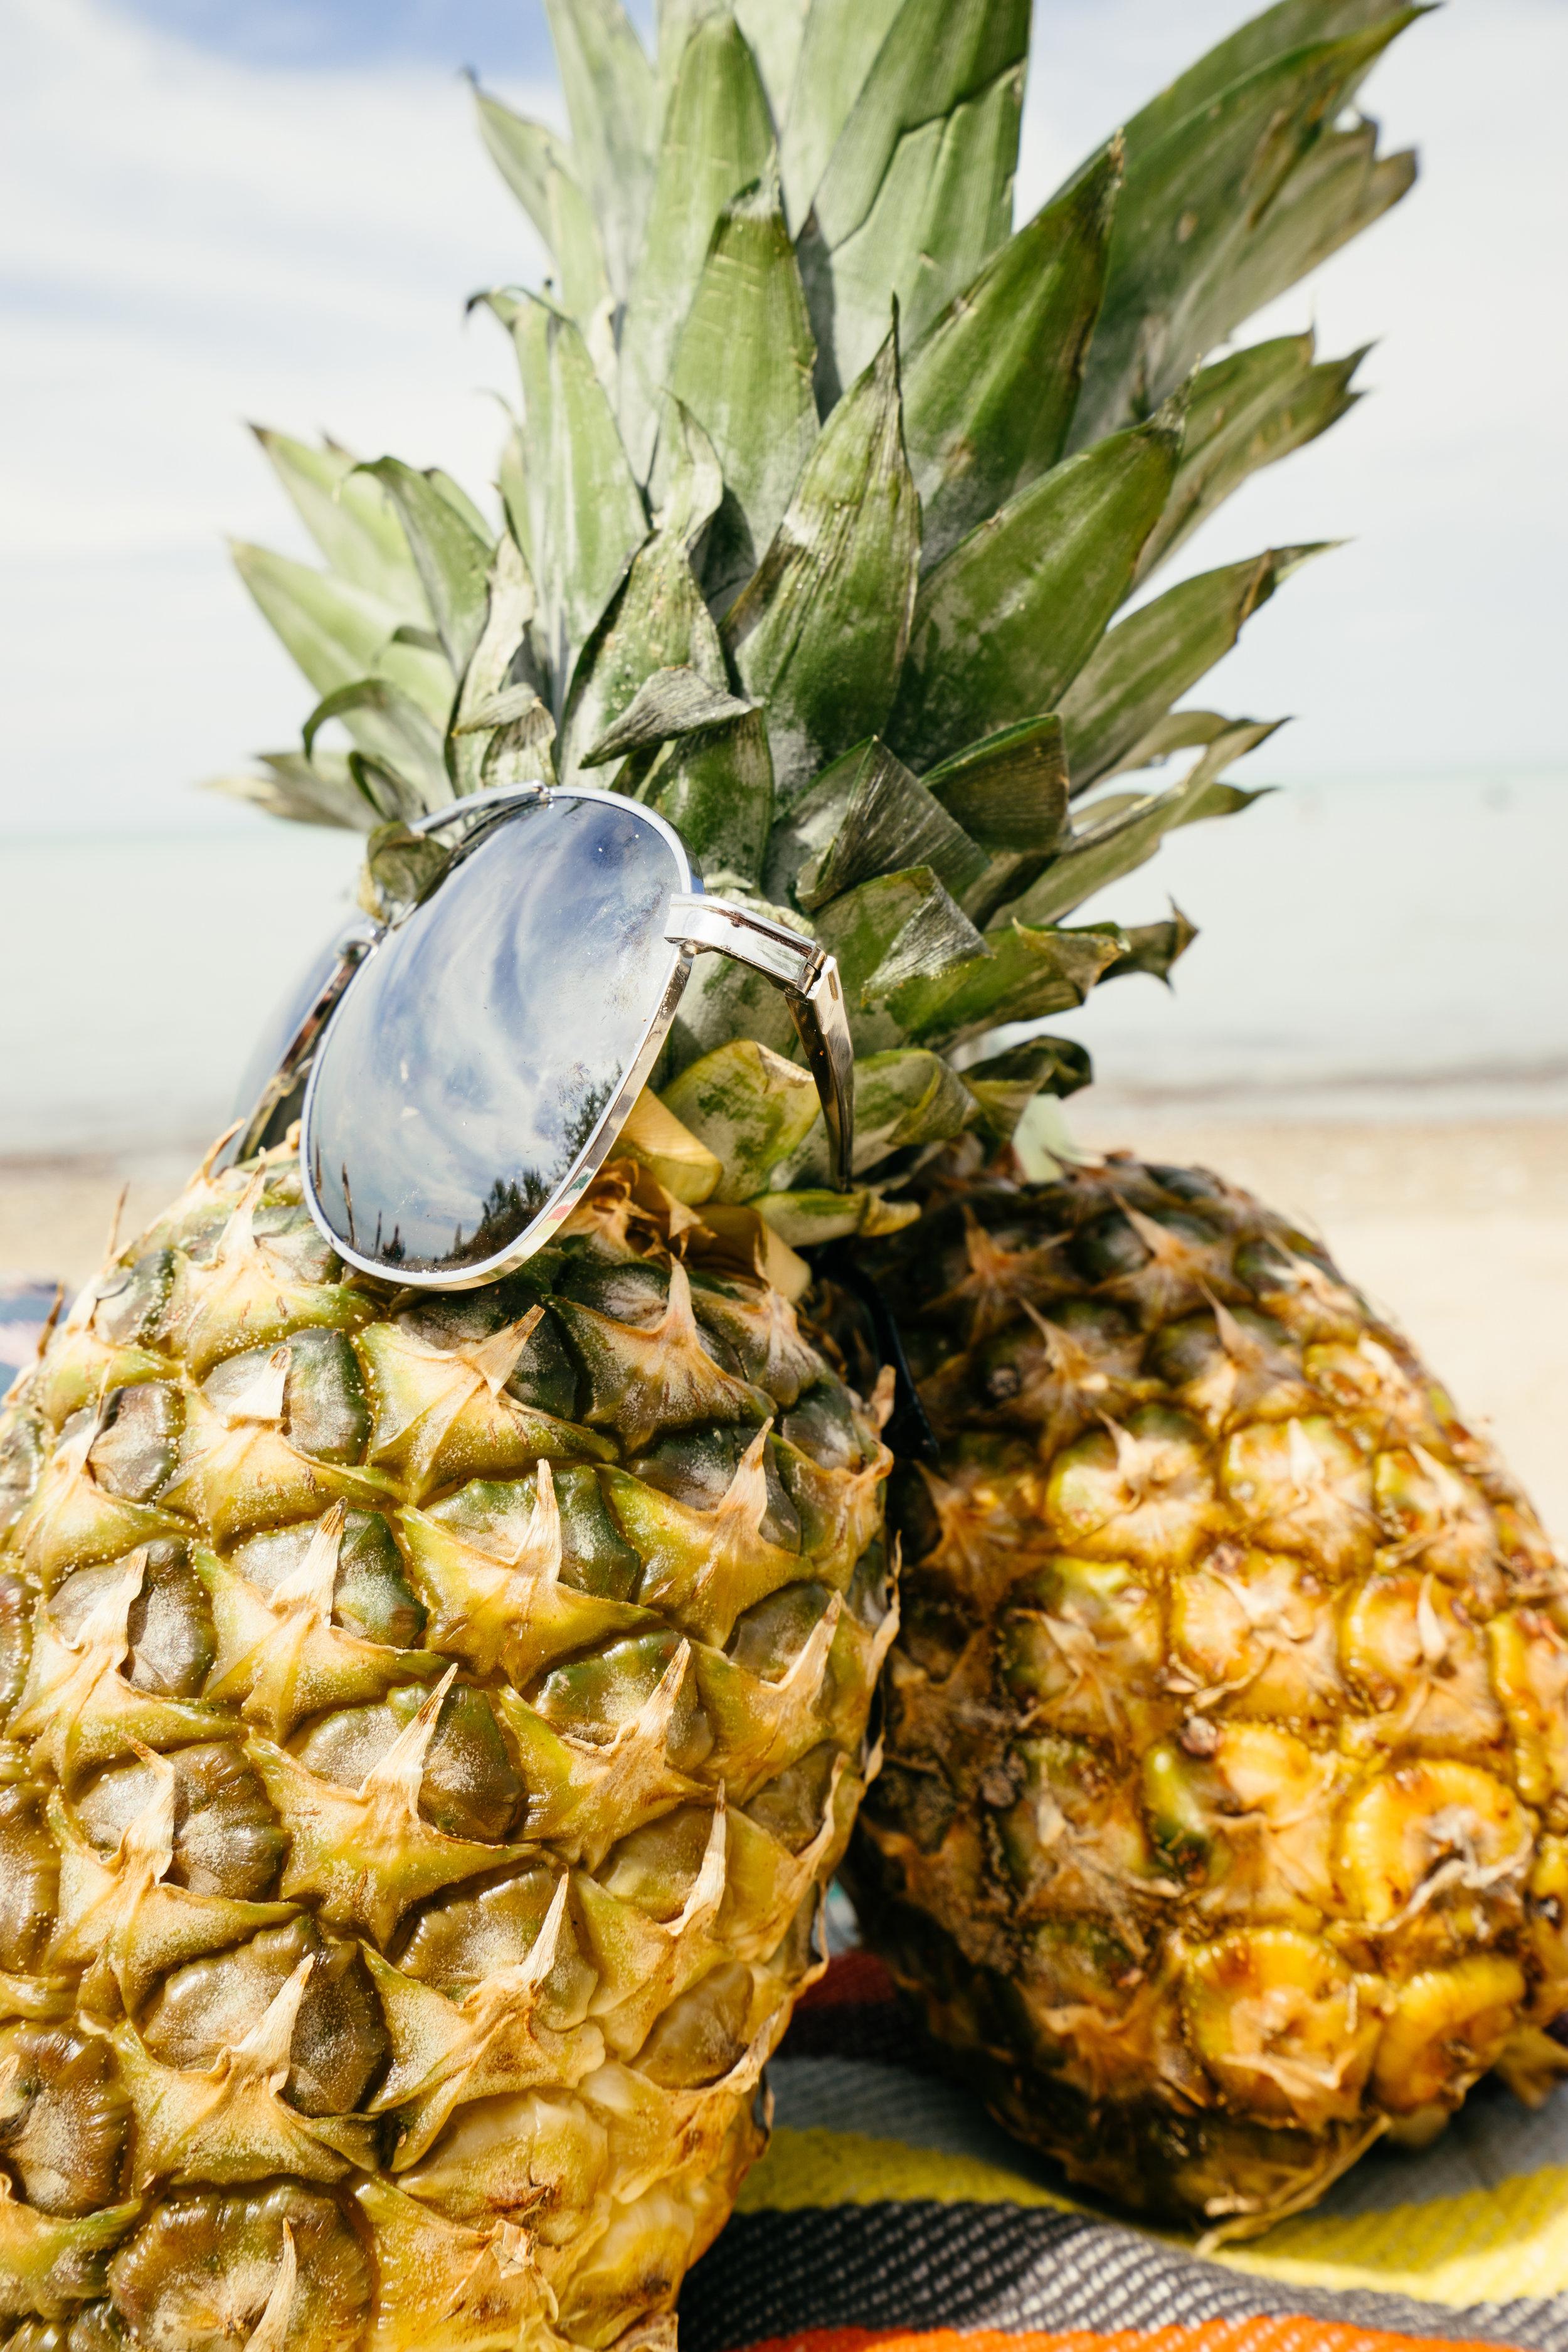 Visit a pineapple farm